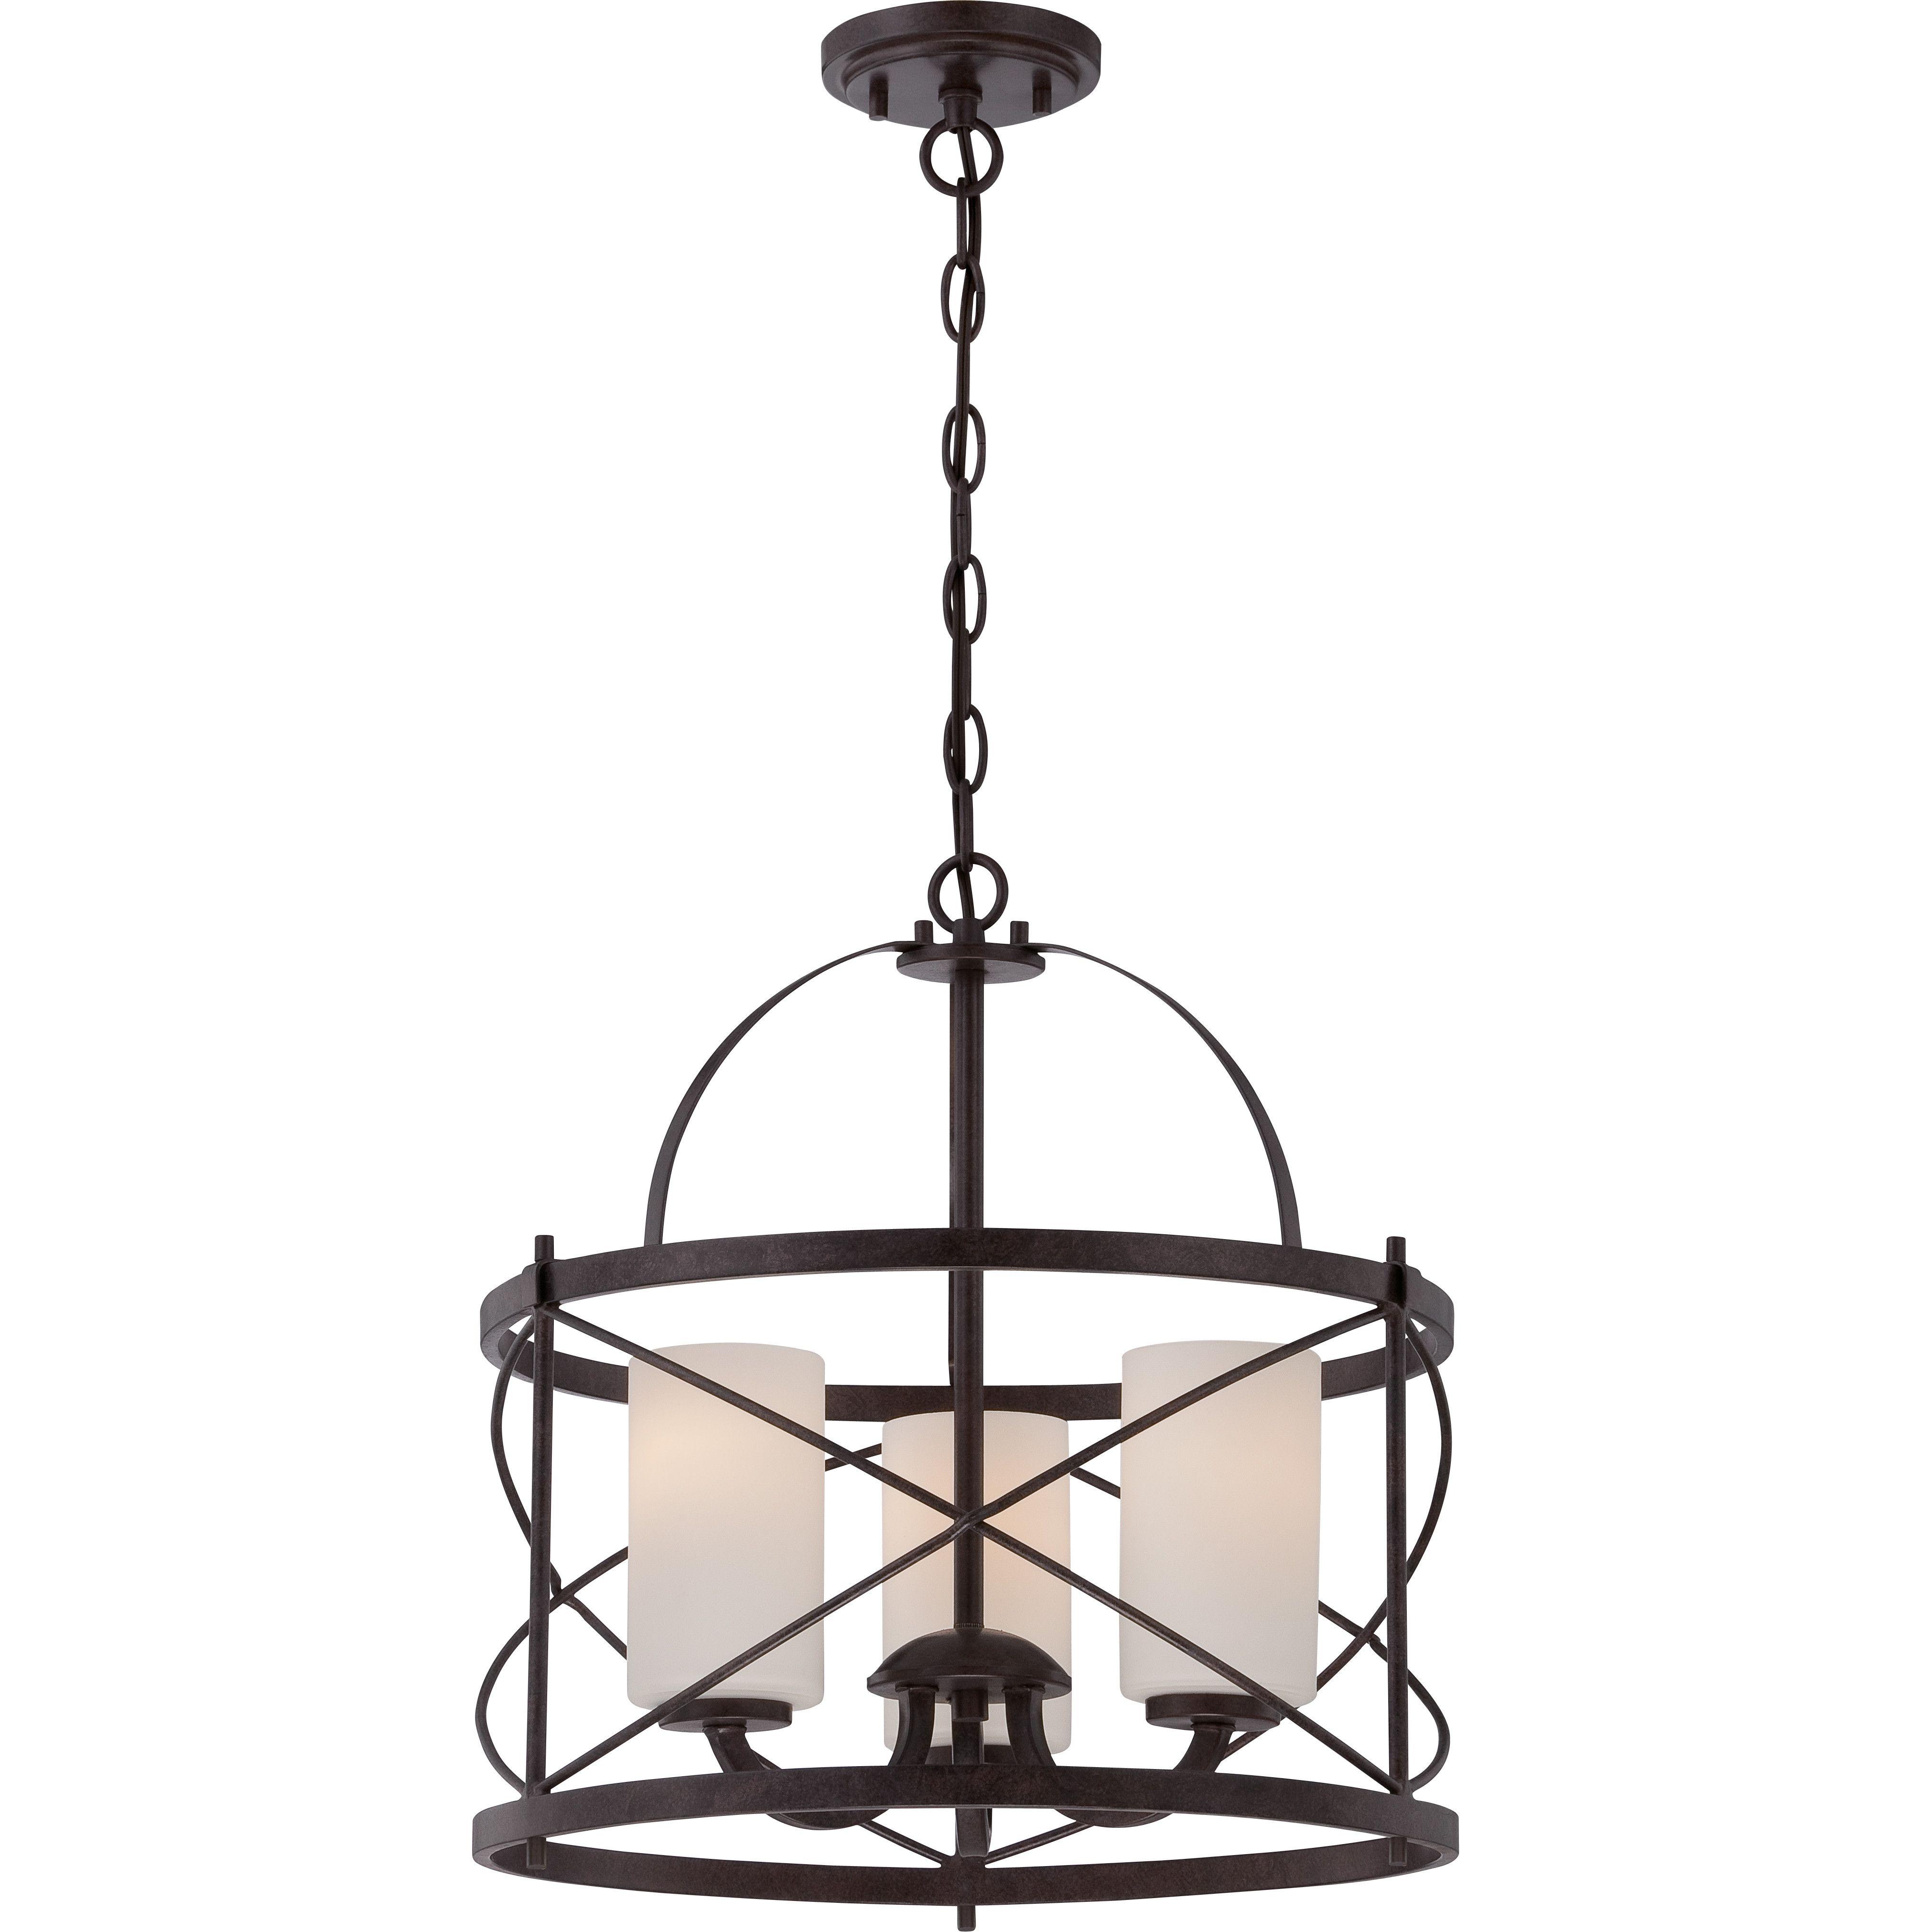 Leeza Pendant   Kitchen Lighting   Pendant Lighting, Ceiling Regarding Farrier 3 Light Lantern Drum Pendants (View 9 of 30)